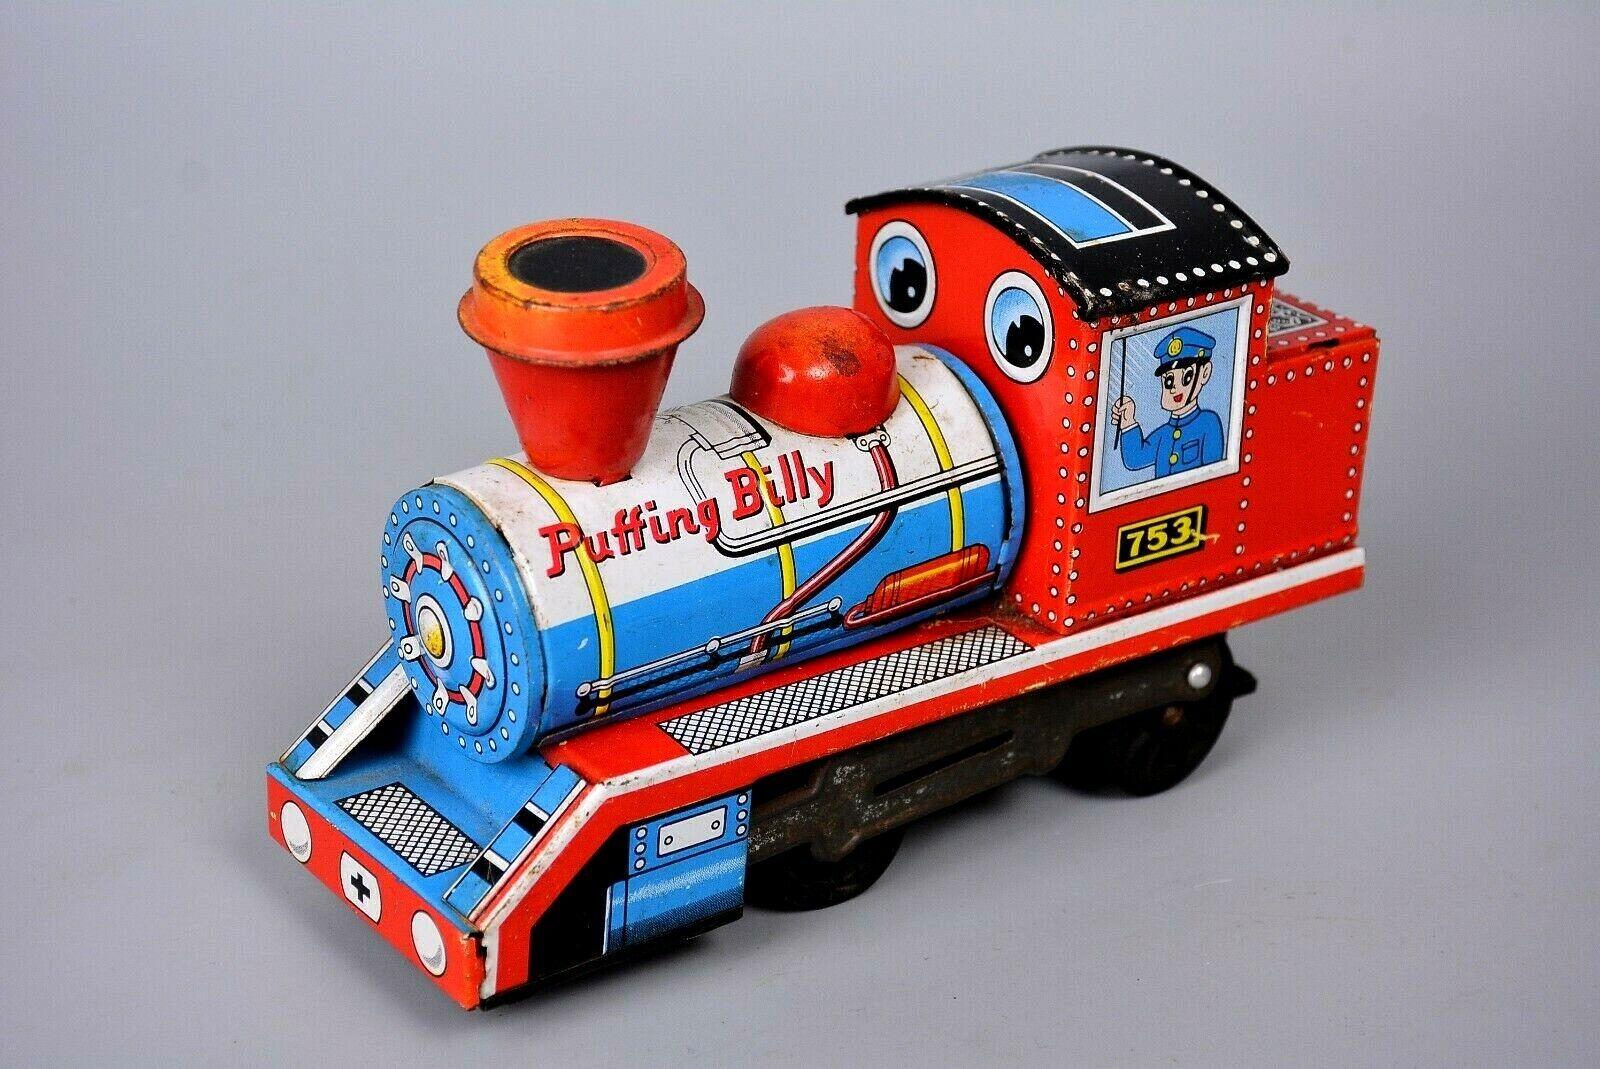 Vintage Puffing Billy Japanese Tinplate Steam Railway Engine, Daiya, Push Along